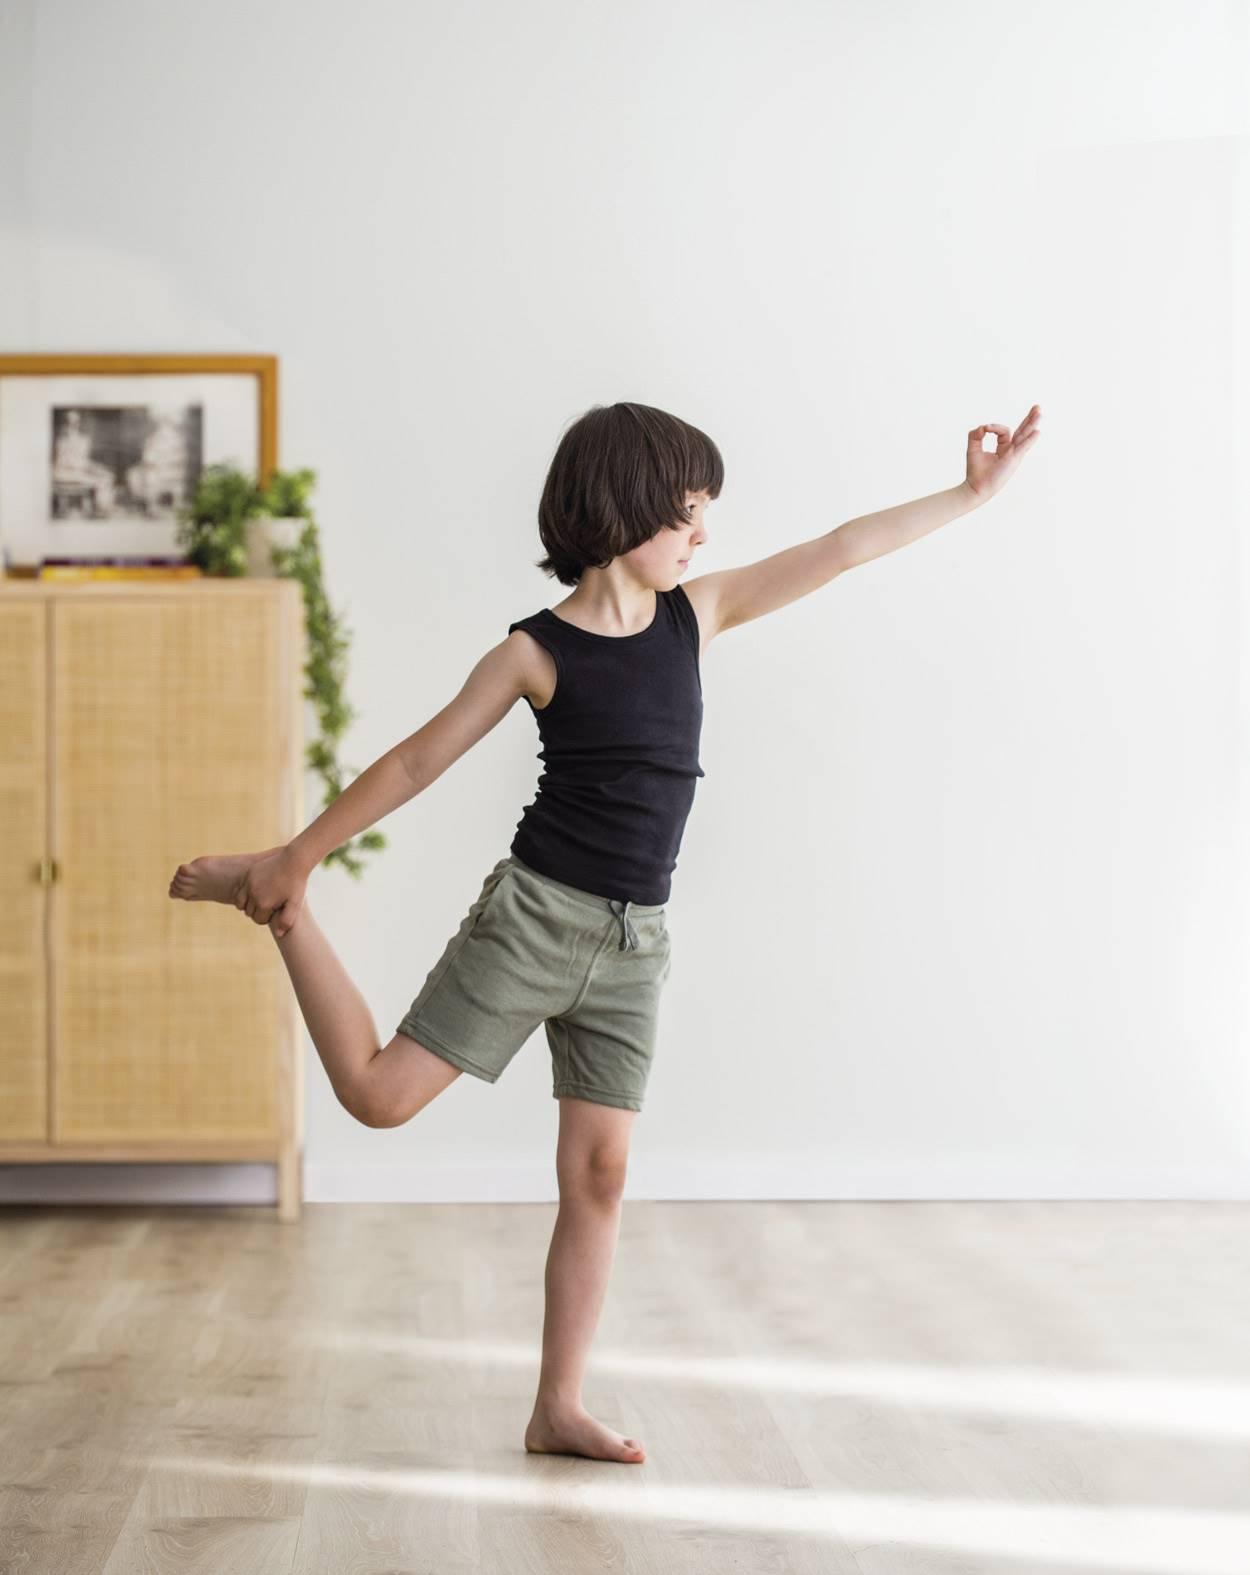 Yoga exercises with kids